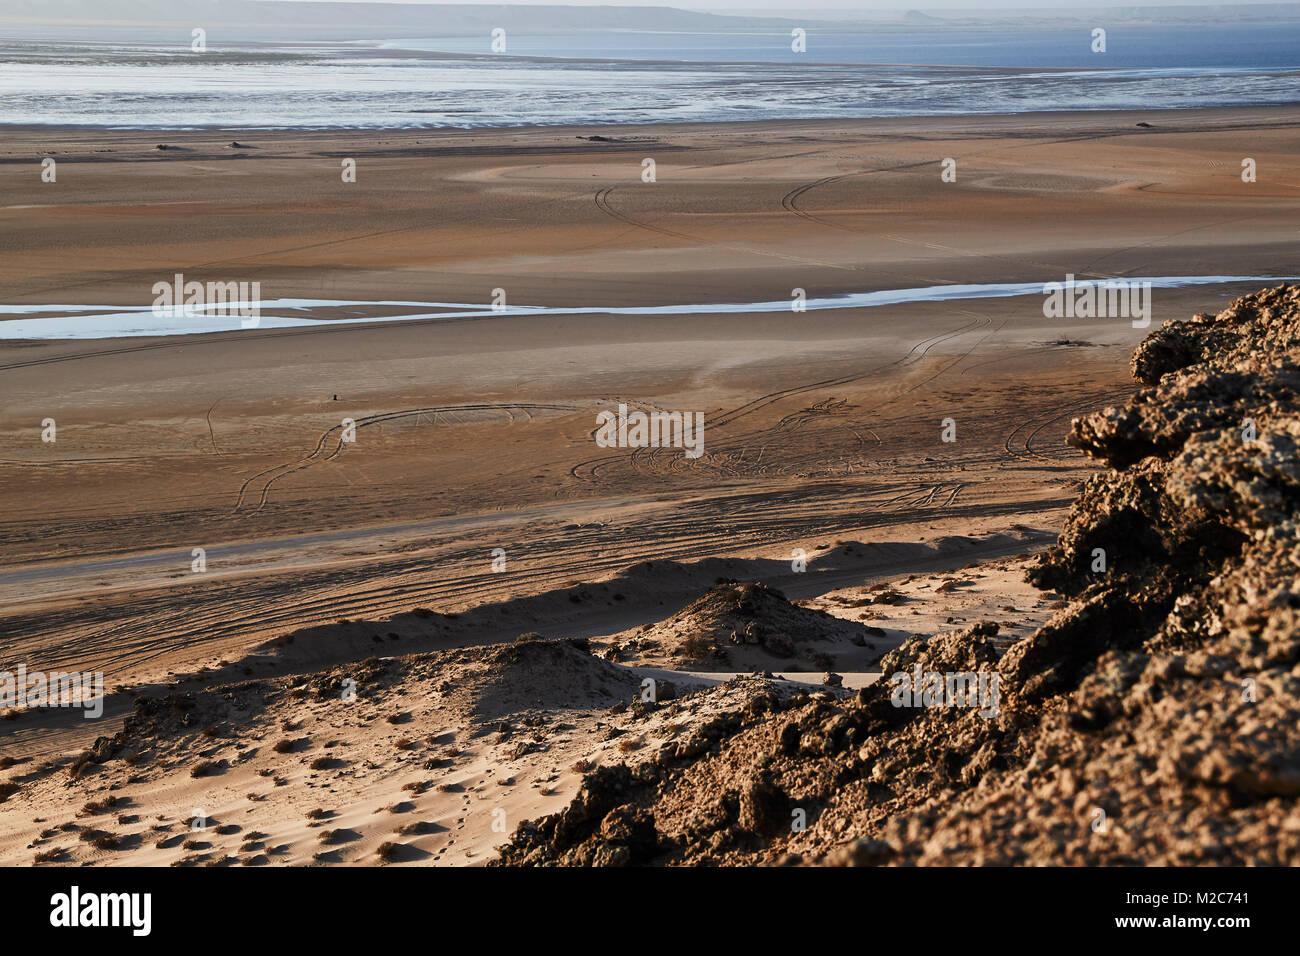 Water in the desert - Stock Image